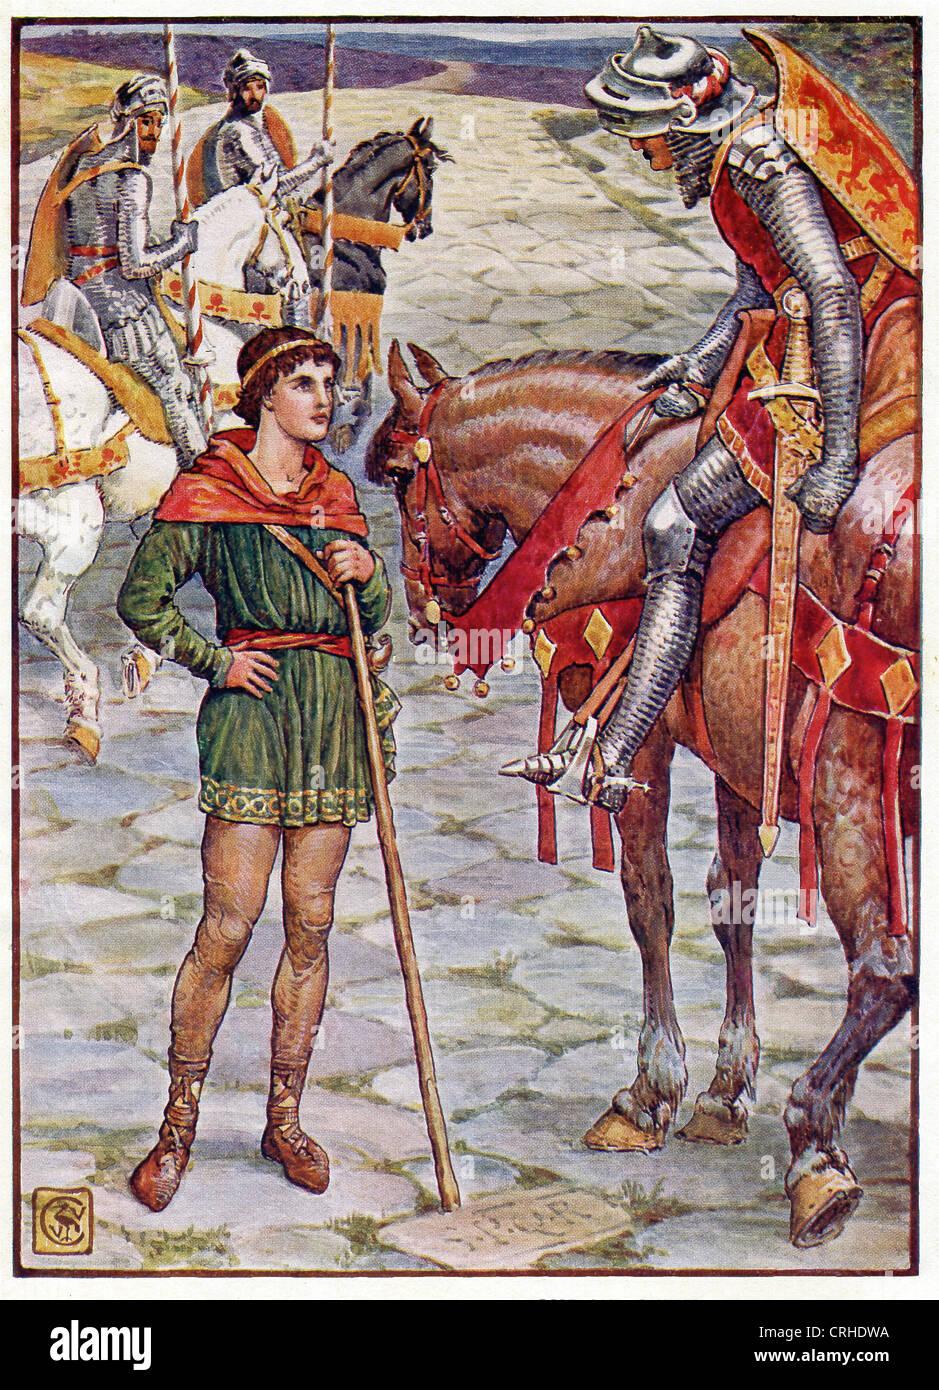 Perceval, Un Chevalier De La Table Ronde Du Roi Arthur